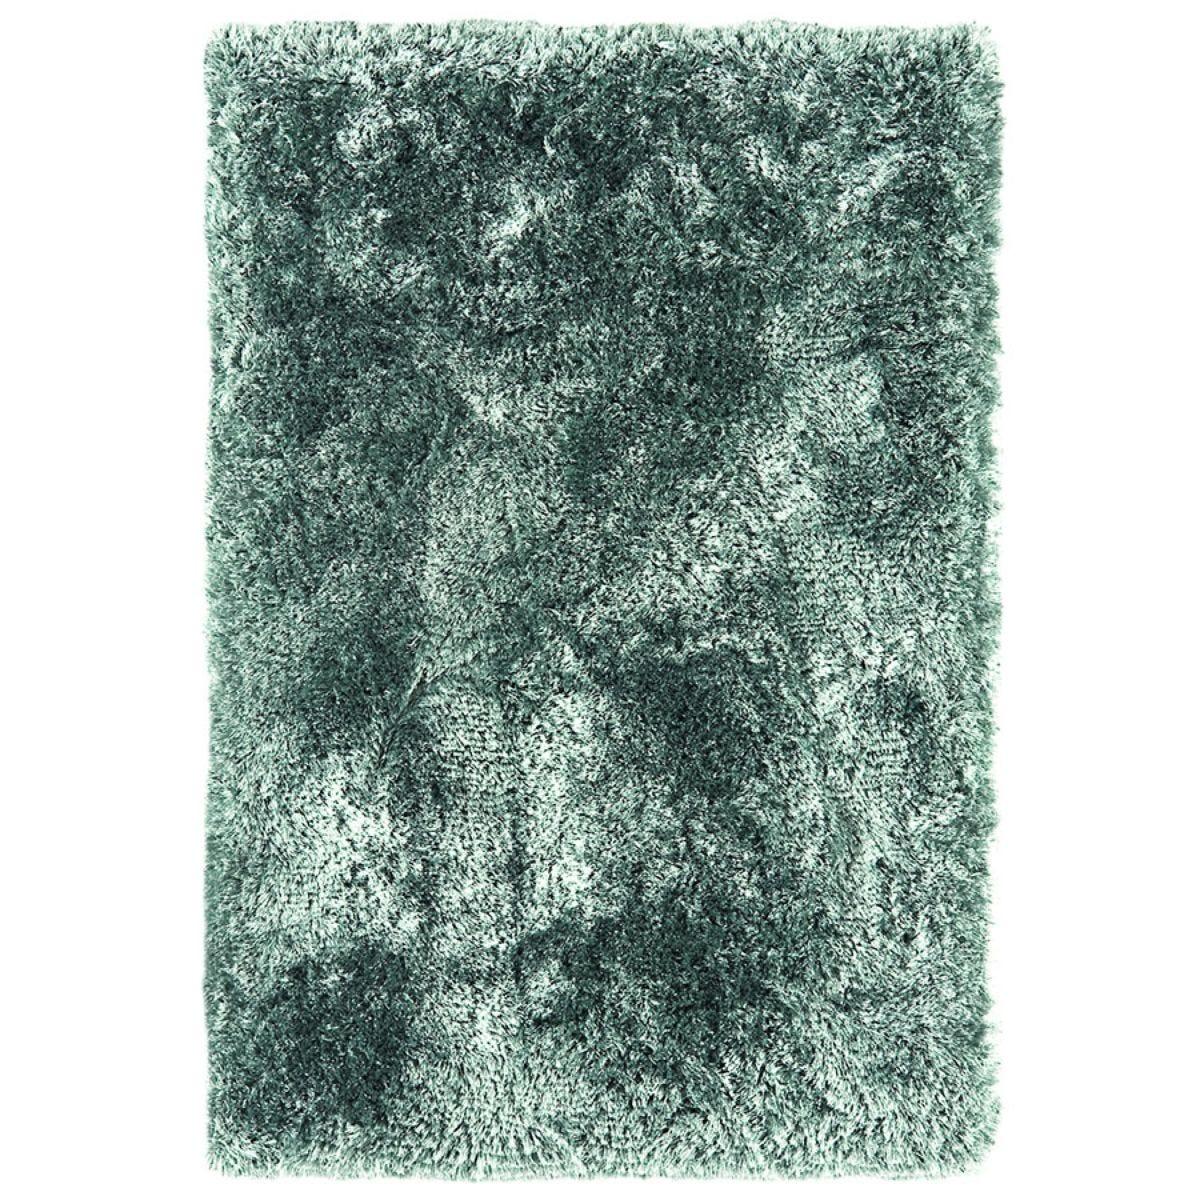 Asiatic Plush Shaggy Rug, 140 x 200cm - Ocean